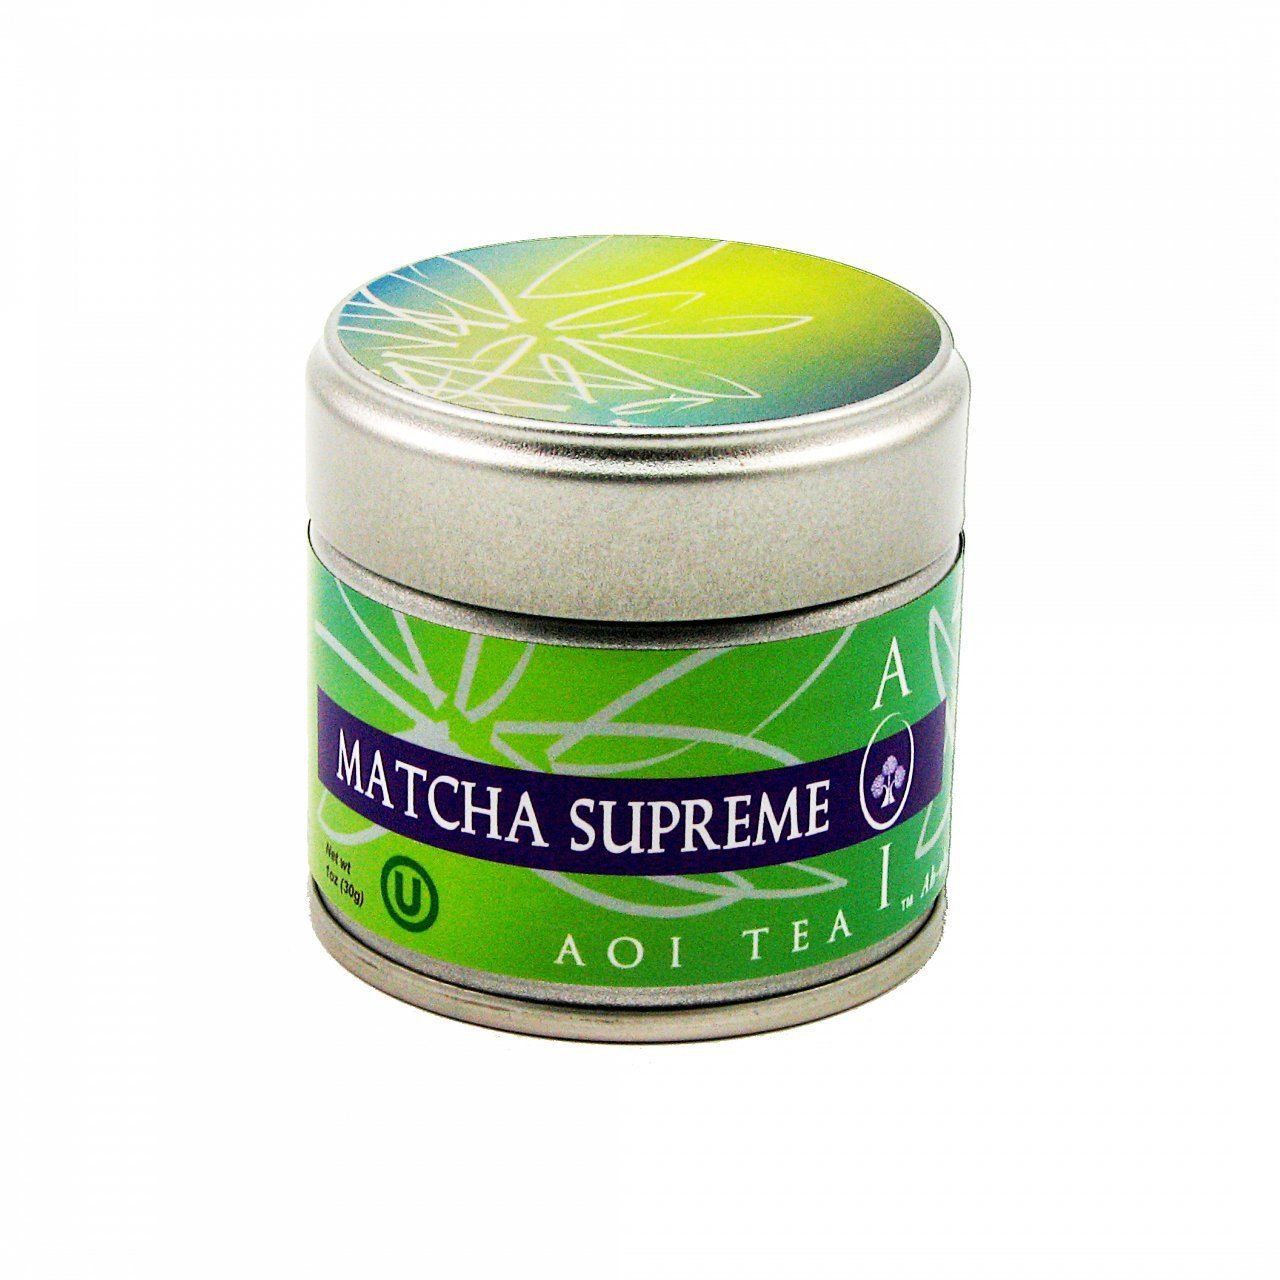 AOI Tea Japanese Matcha Supreme Green Tea Powder 1 Ounce  (30 Grams)